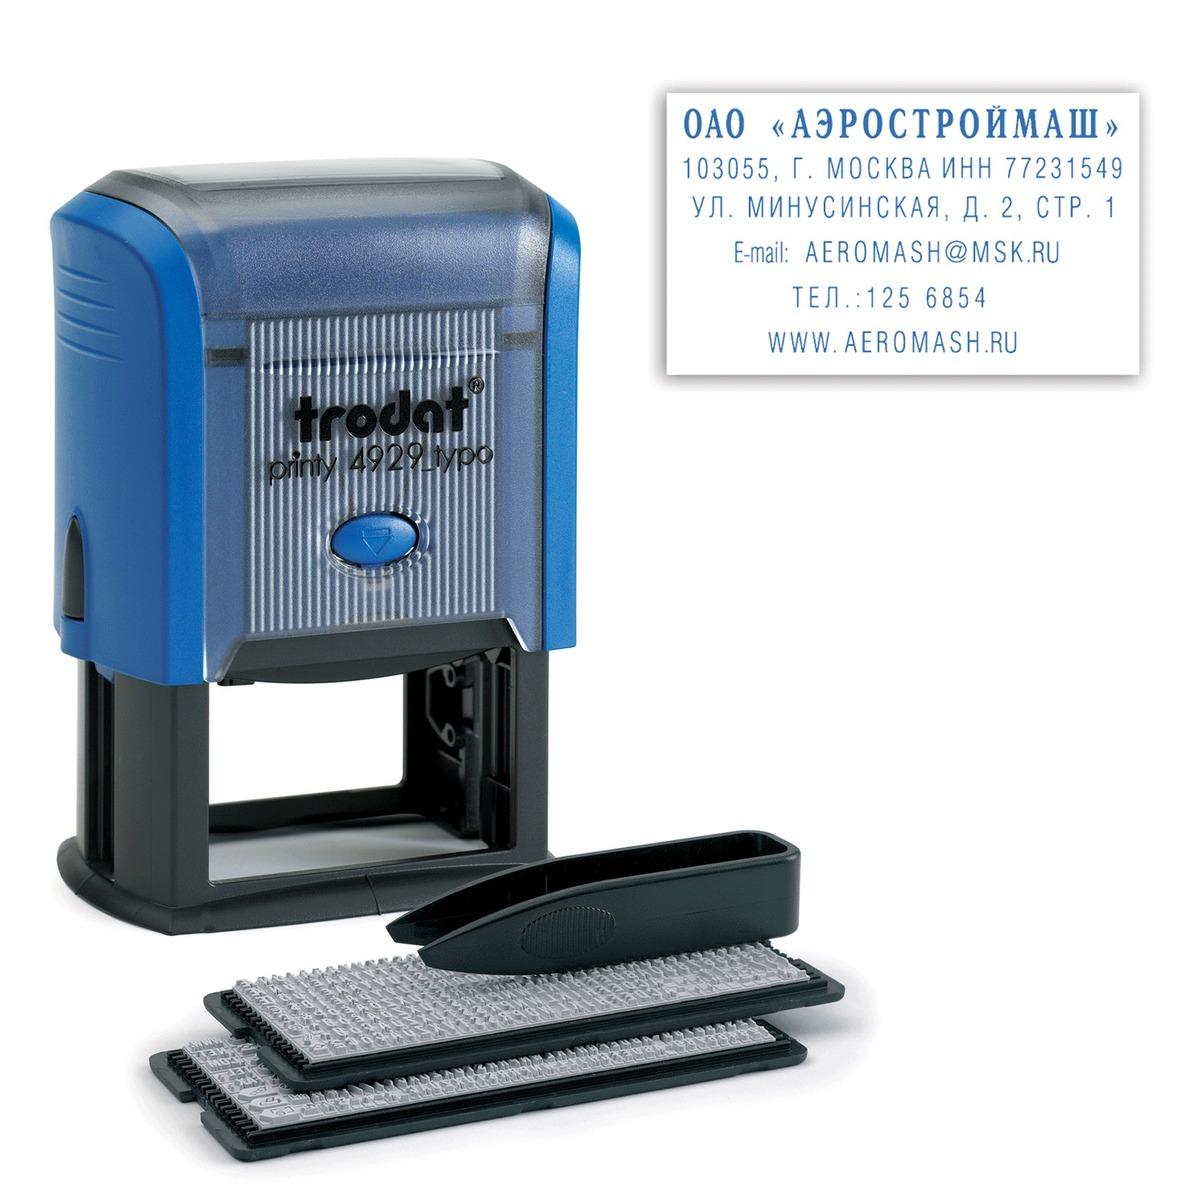 Trodat Штамп самонаборный шестистрочный 50 х 30 мм -  Печати, штампы